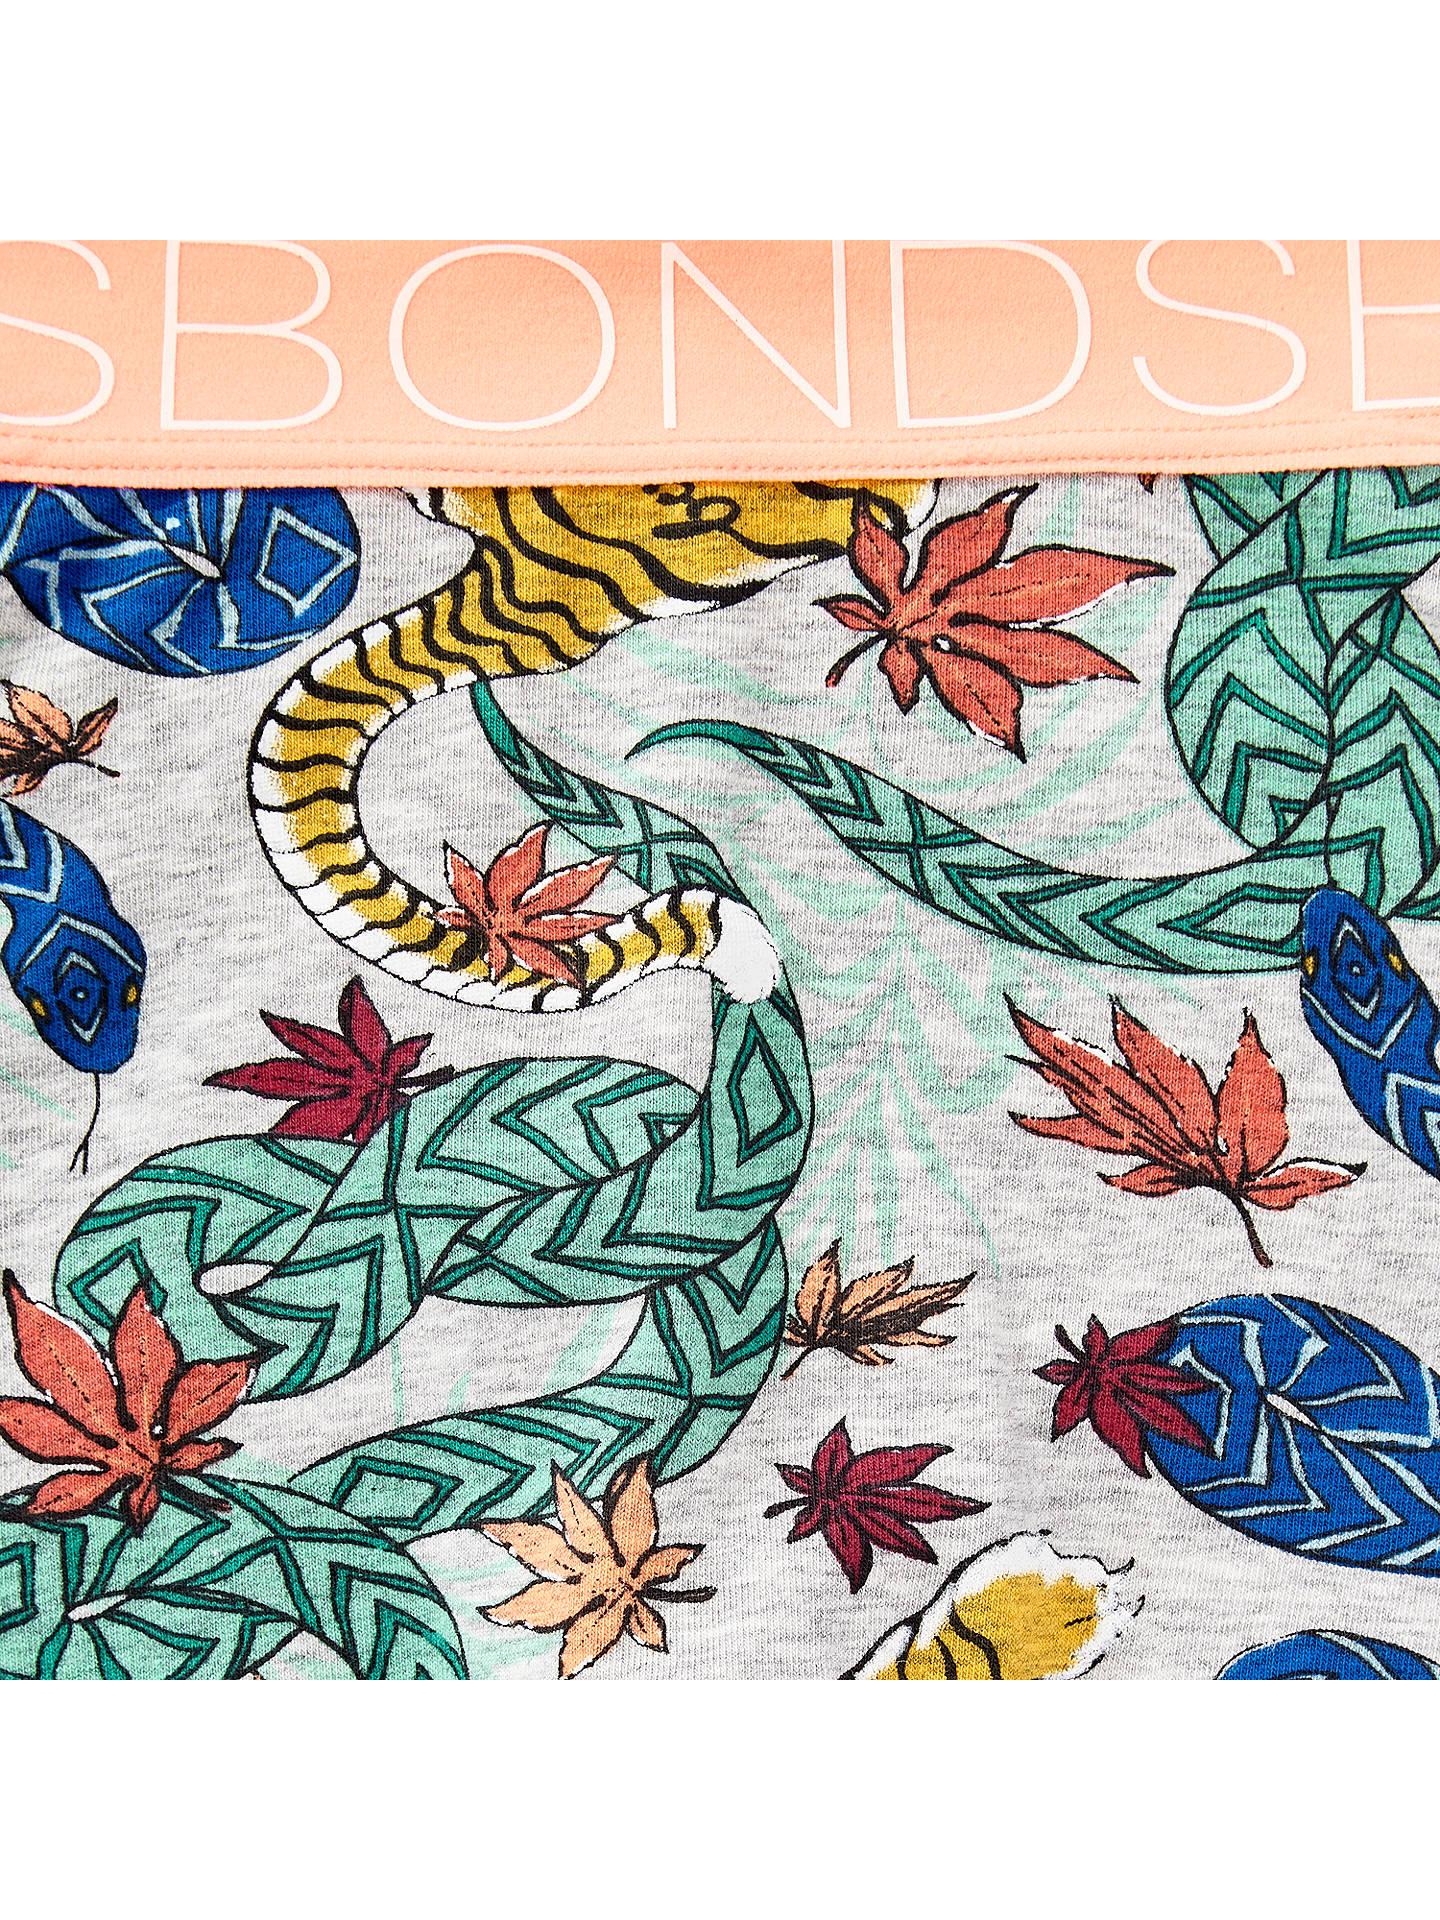 79d7e78ce5fe0 Buy Bonds Baby Jungle Leggings, Grey, 0-3 months Online at johnlewis.